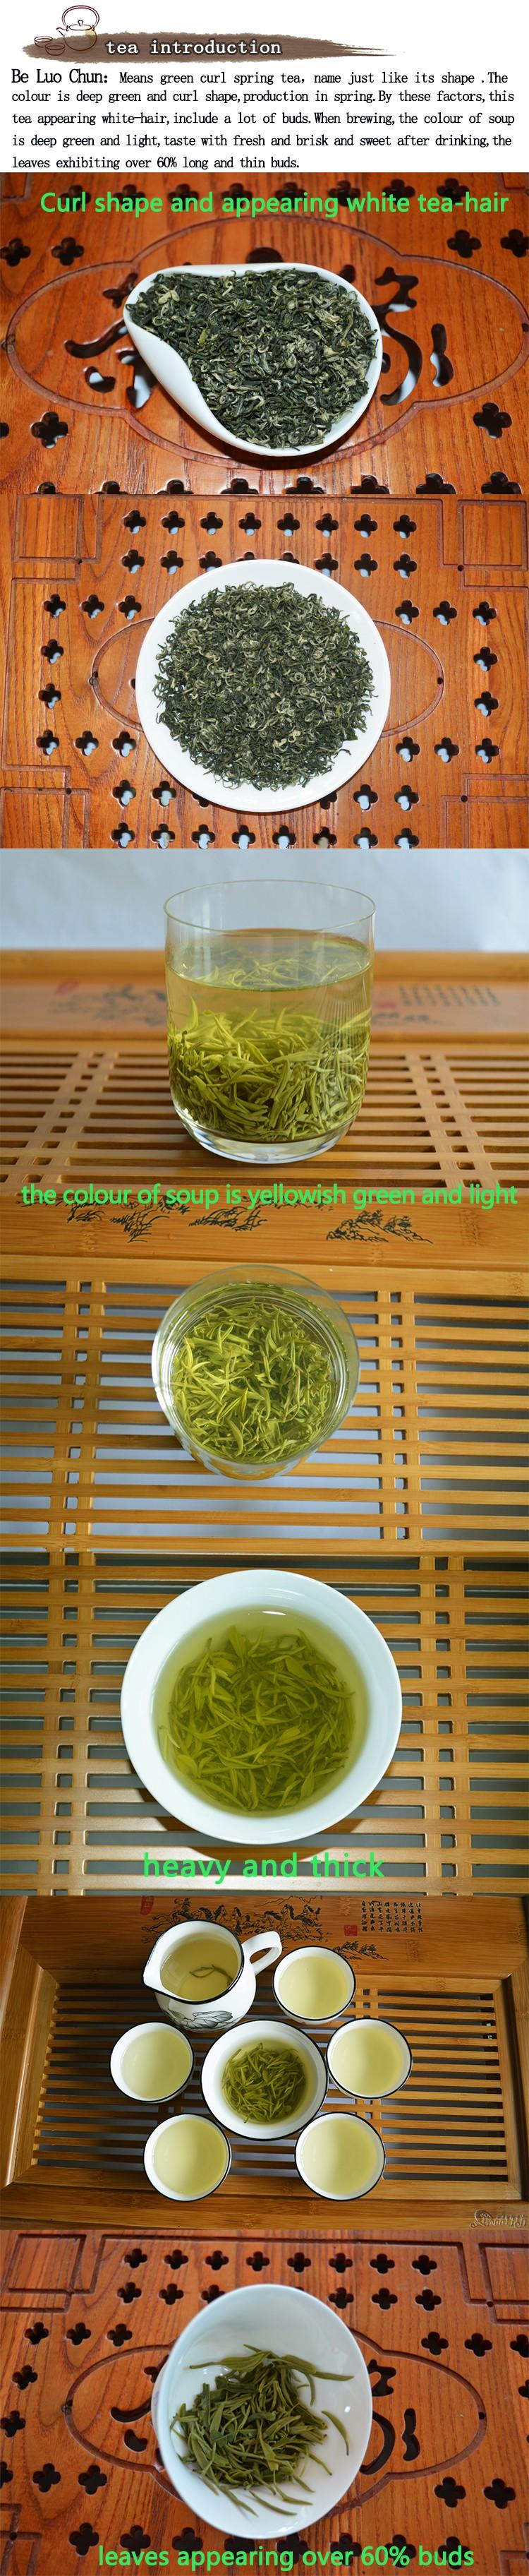 зеленый чай 100 гр фото